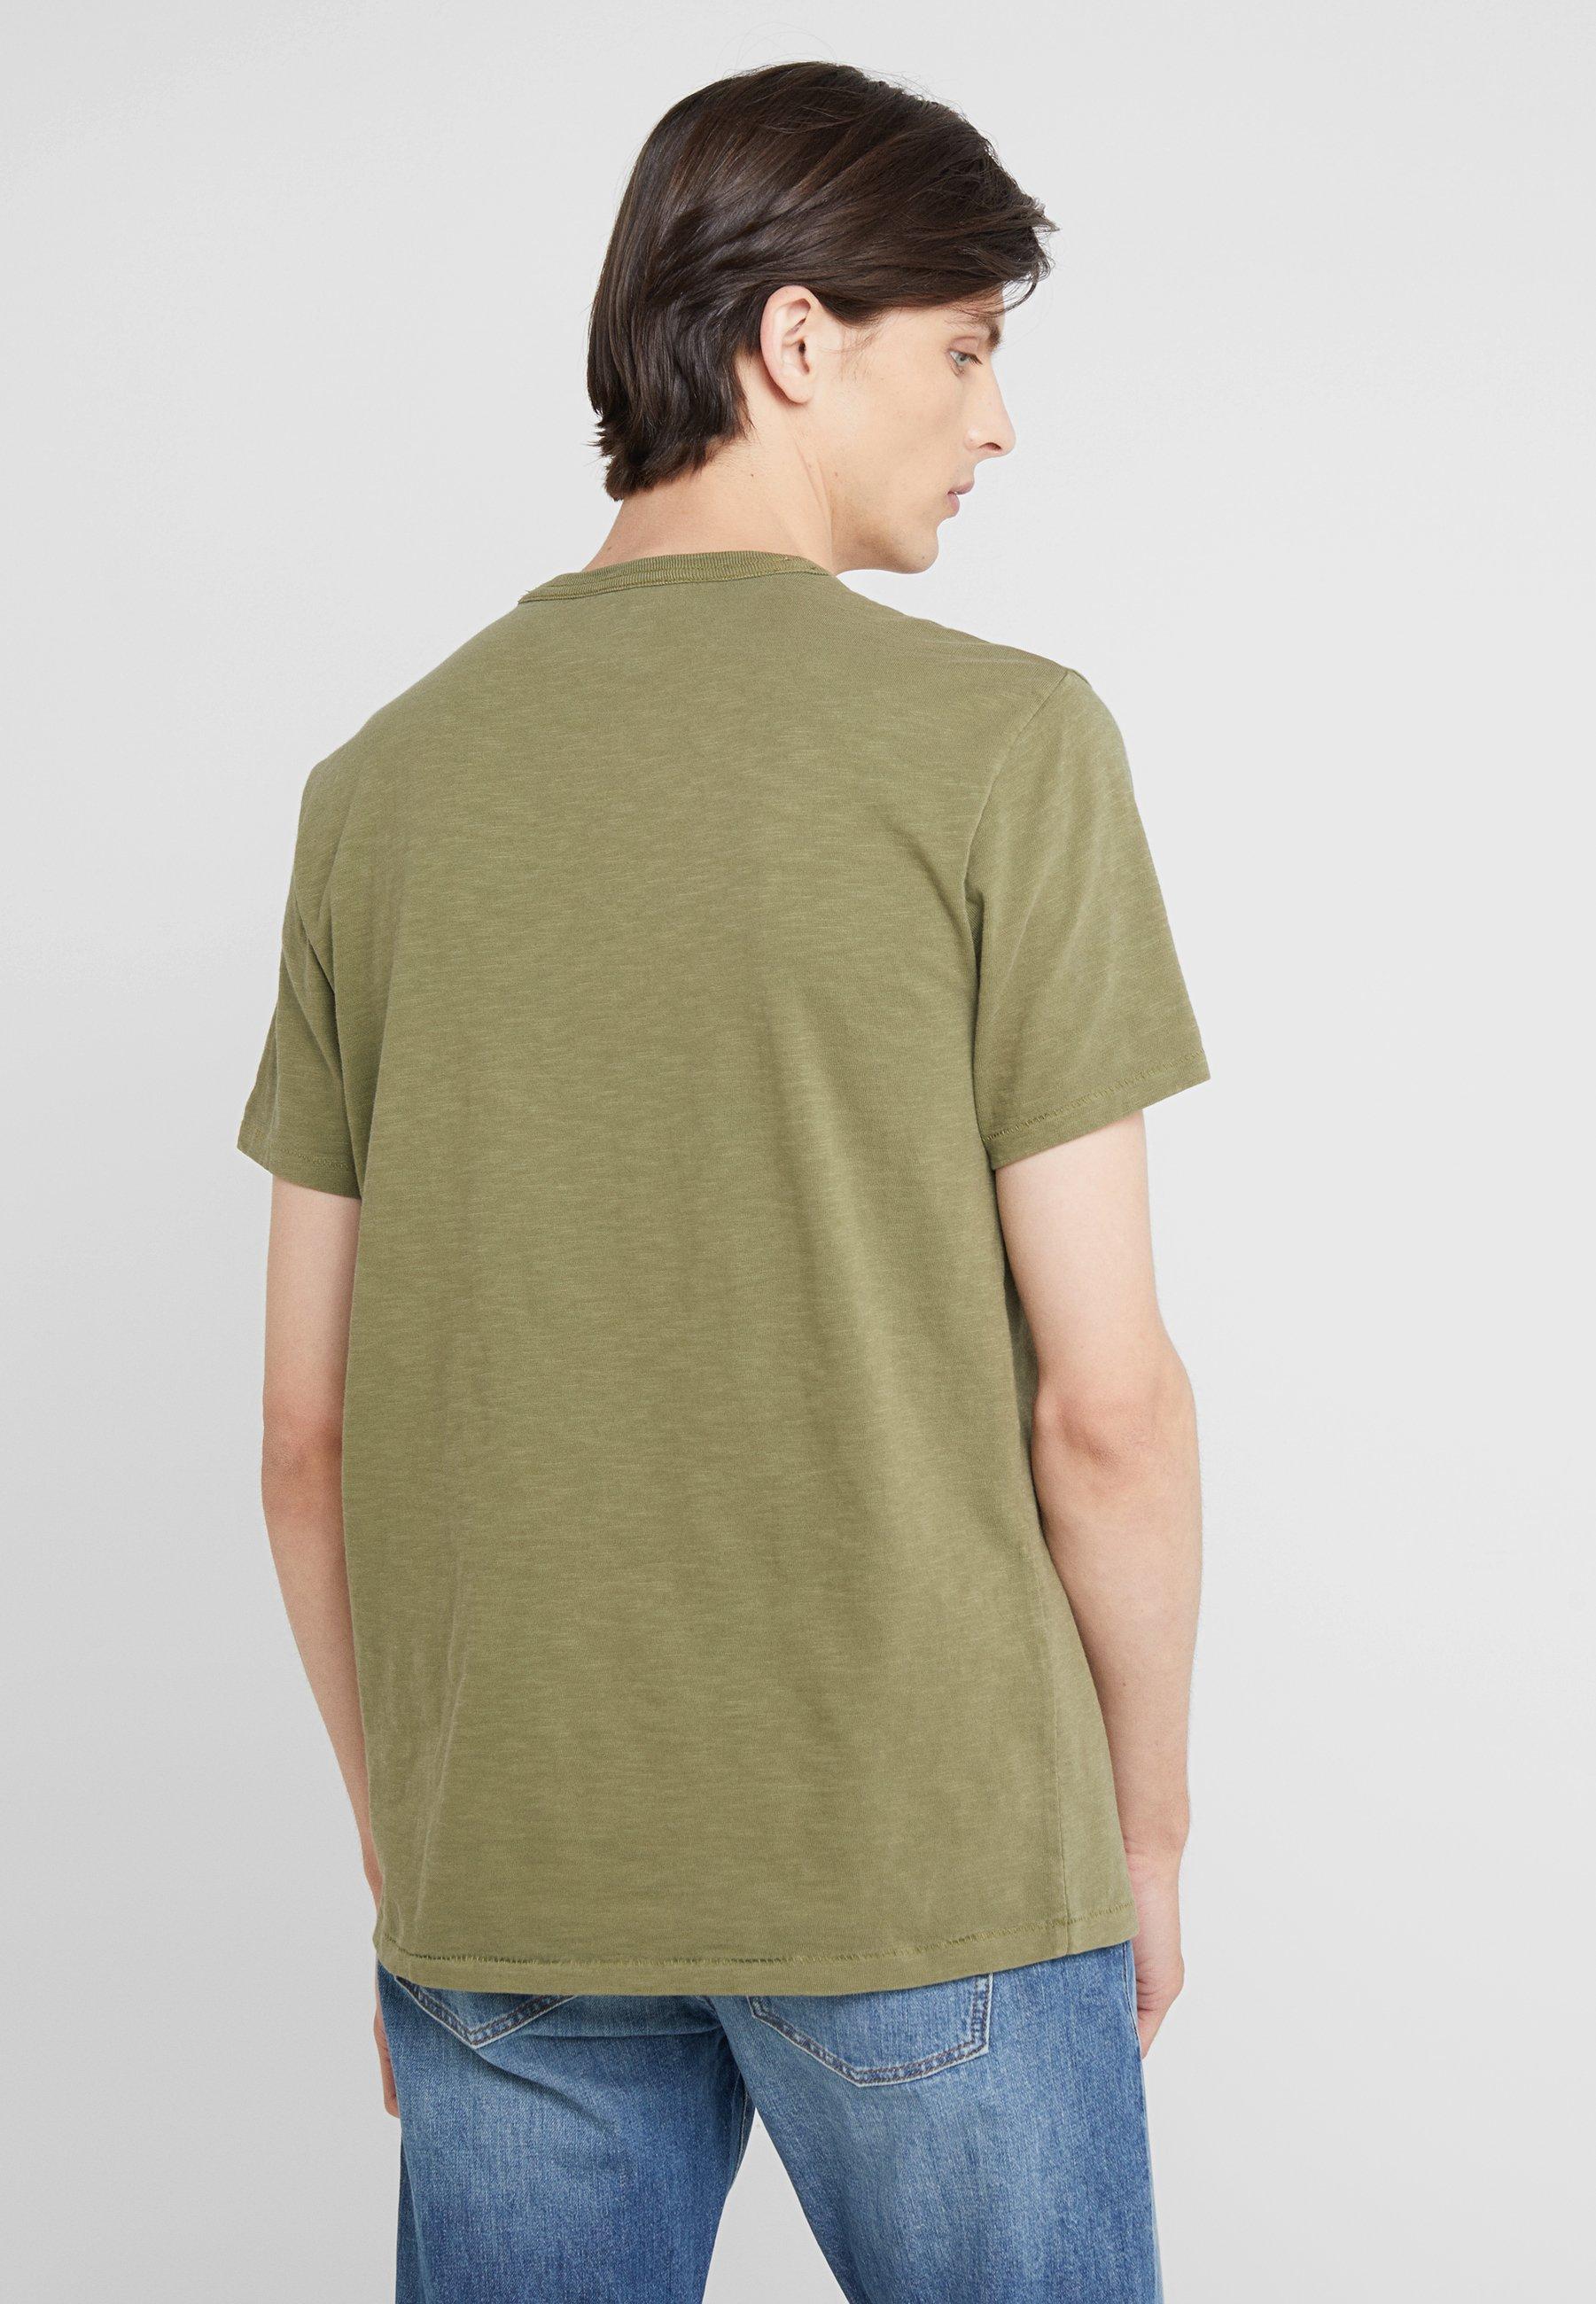 J CrewT shirt Pocket Garment Dye Mountain Olive crew Basique rotdhxsQCB